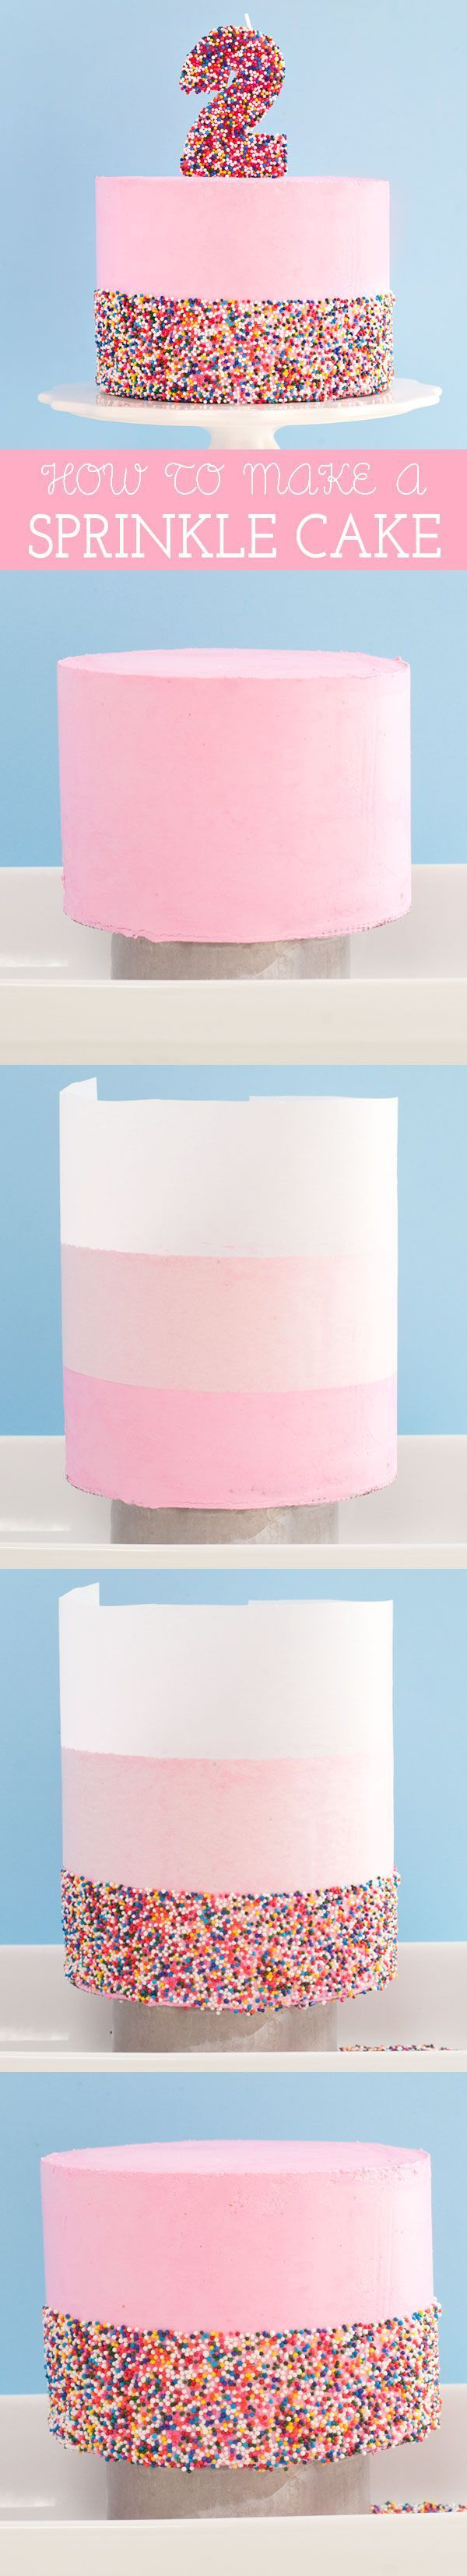 How To Make A Sprinkle Cake | Sprinkles for Breakfast